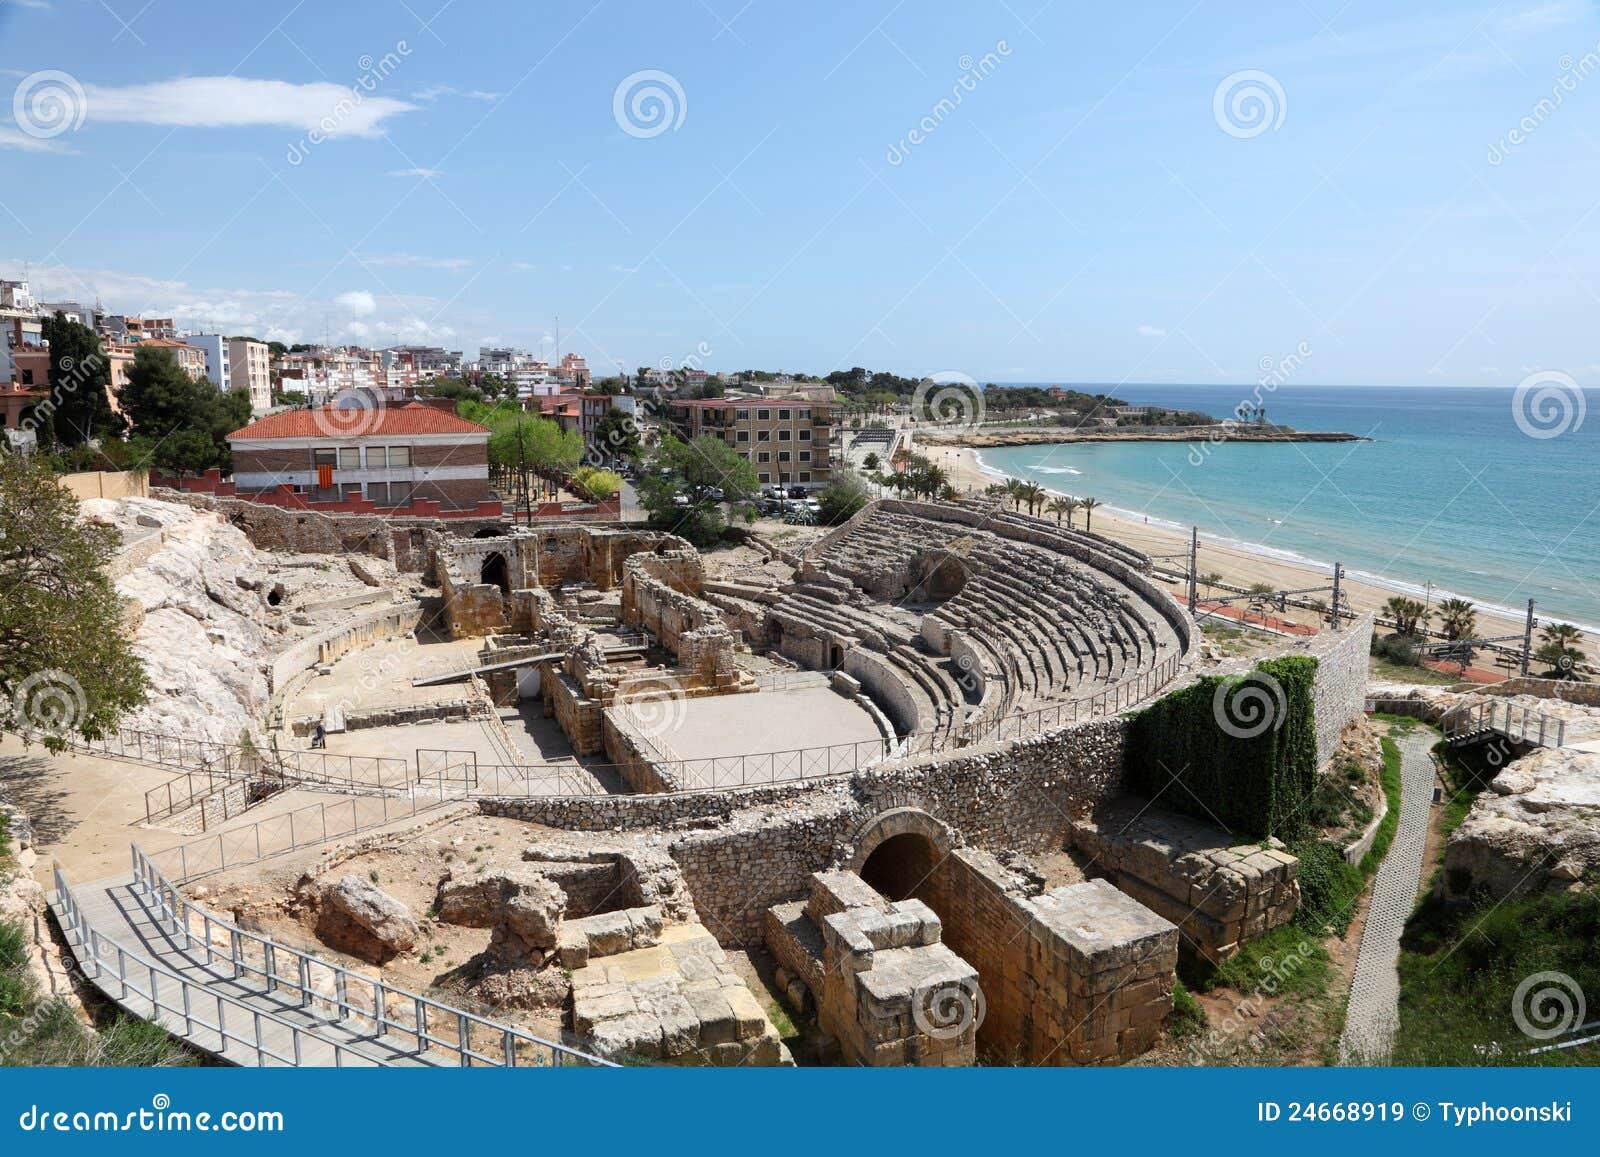 Tarragona Spain  City pictures : Roman Ruins In Tarragona, Spain Royalty Free Stock Images Image ...